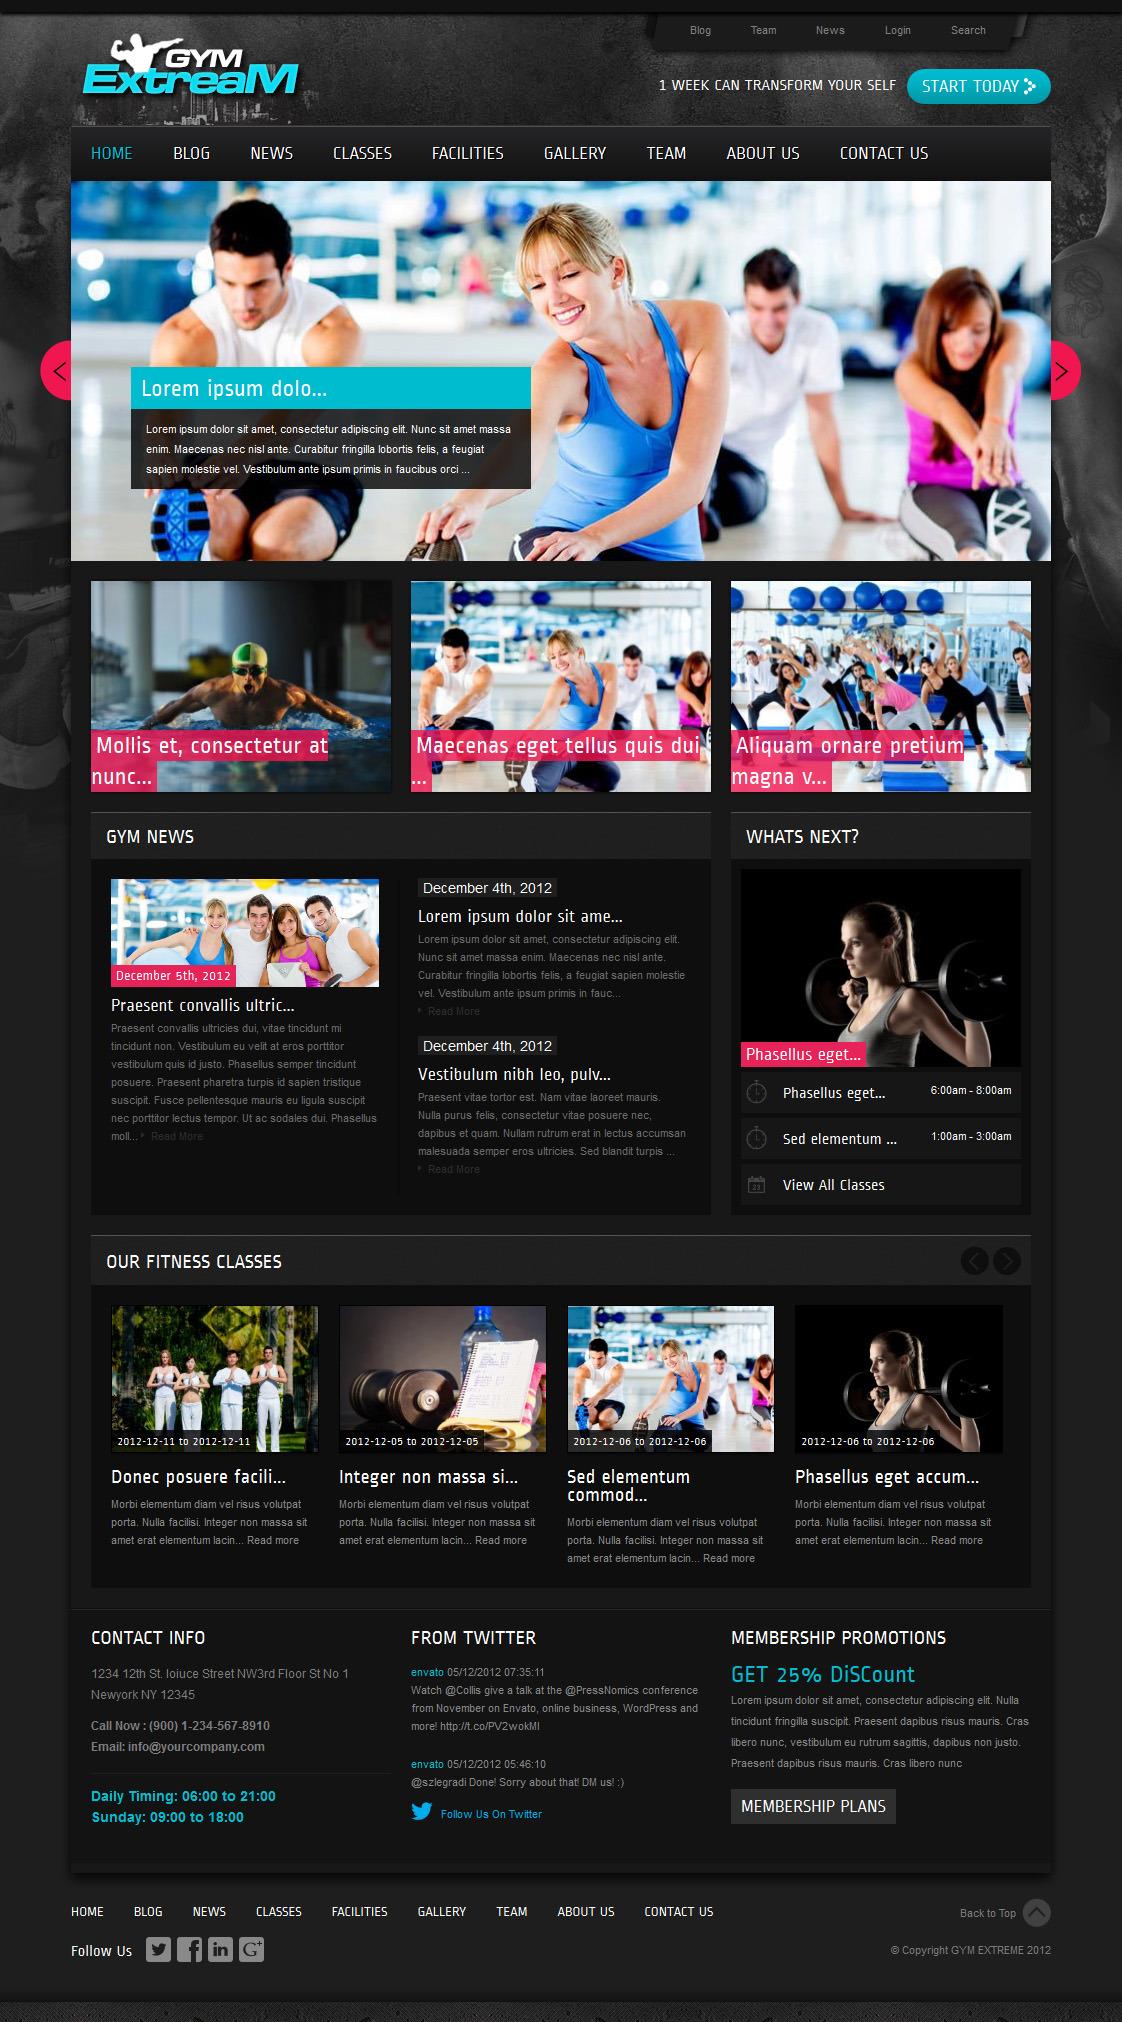 Gym Extream - Gym and Fitness Wordpress Theme - Fitness|Premium wordpress themes